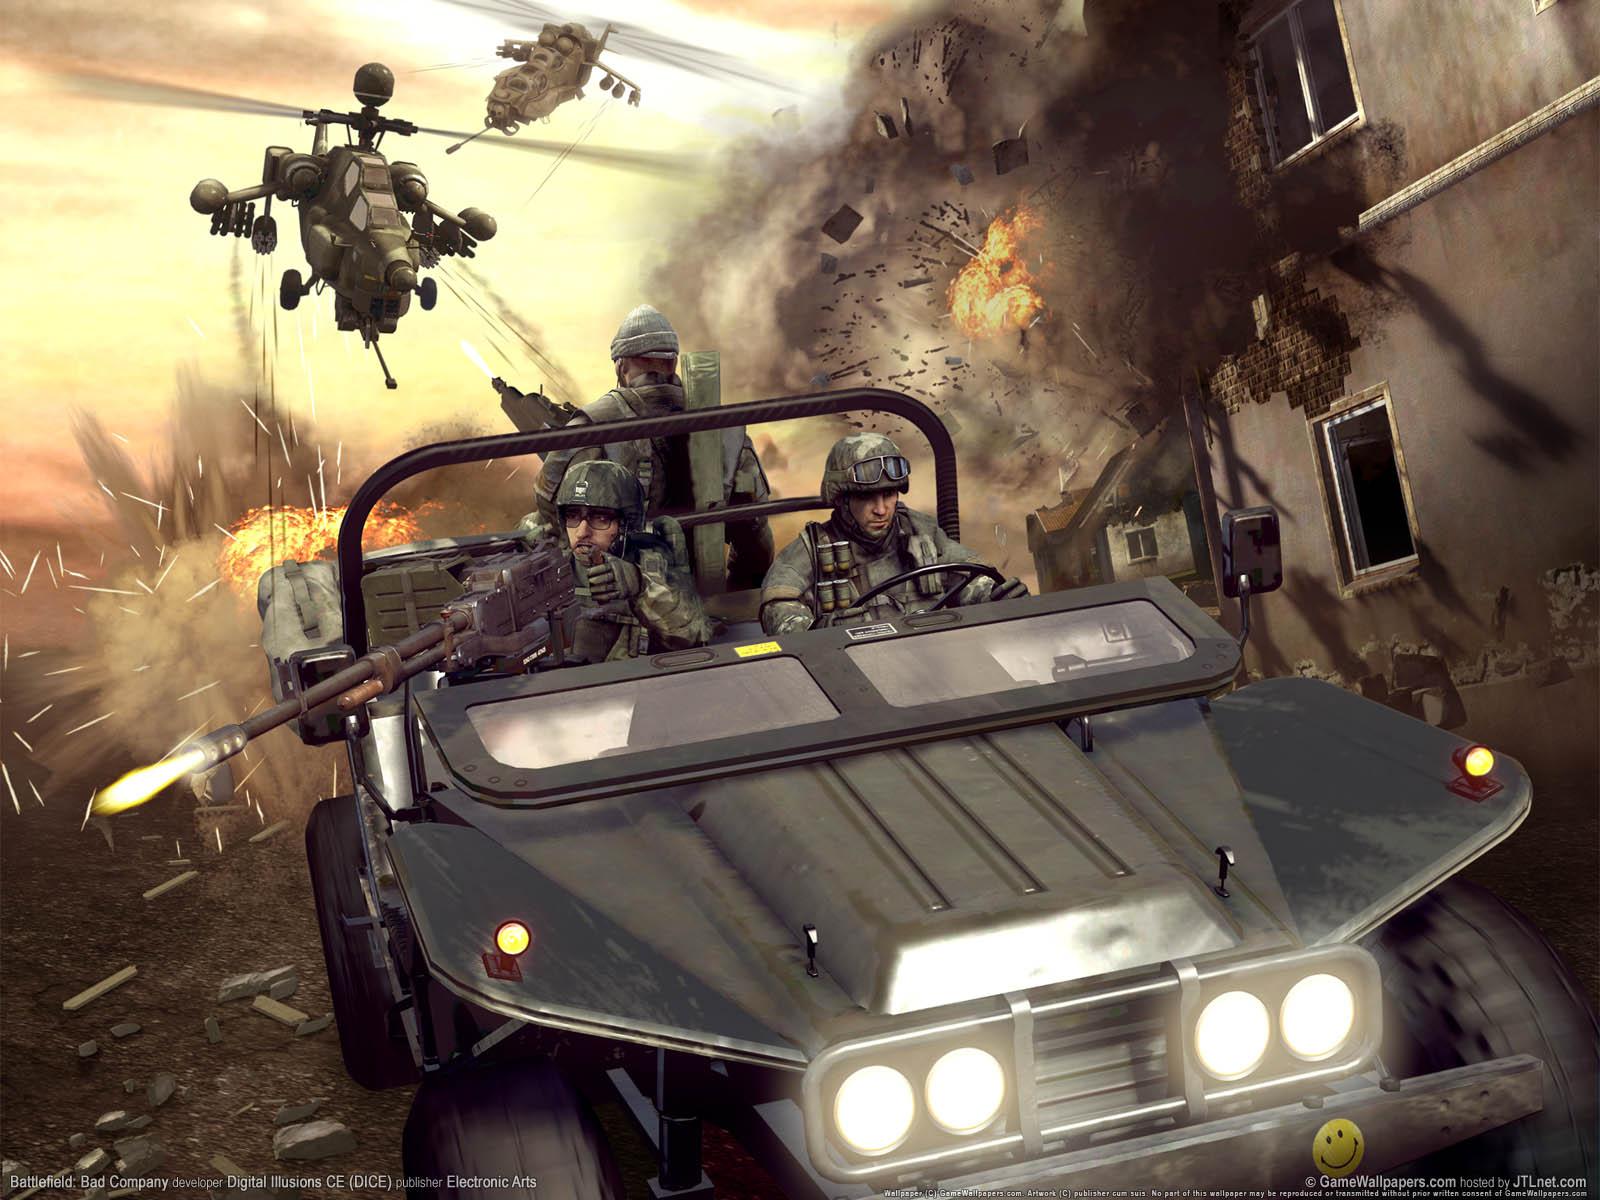 Battlefield: Bad Companyνmmer=01 Hintergrundbild  1600x1200